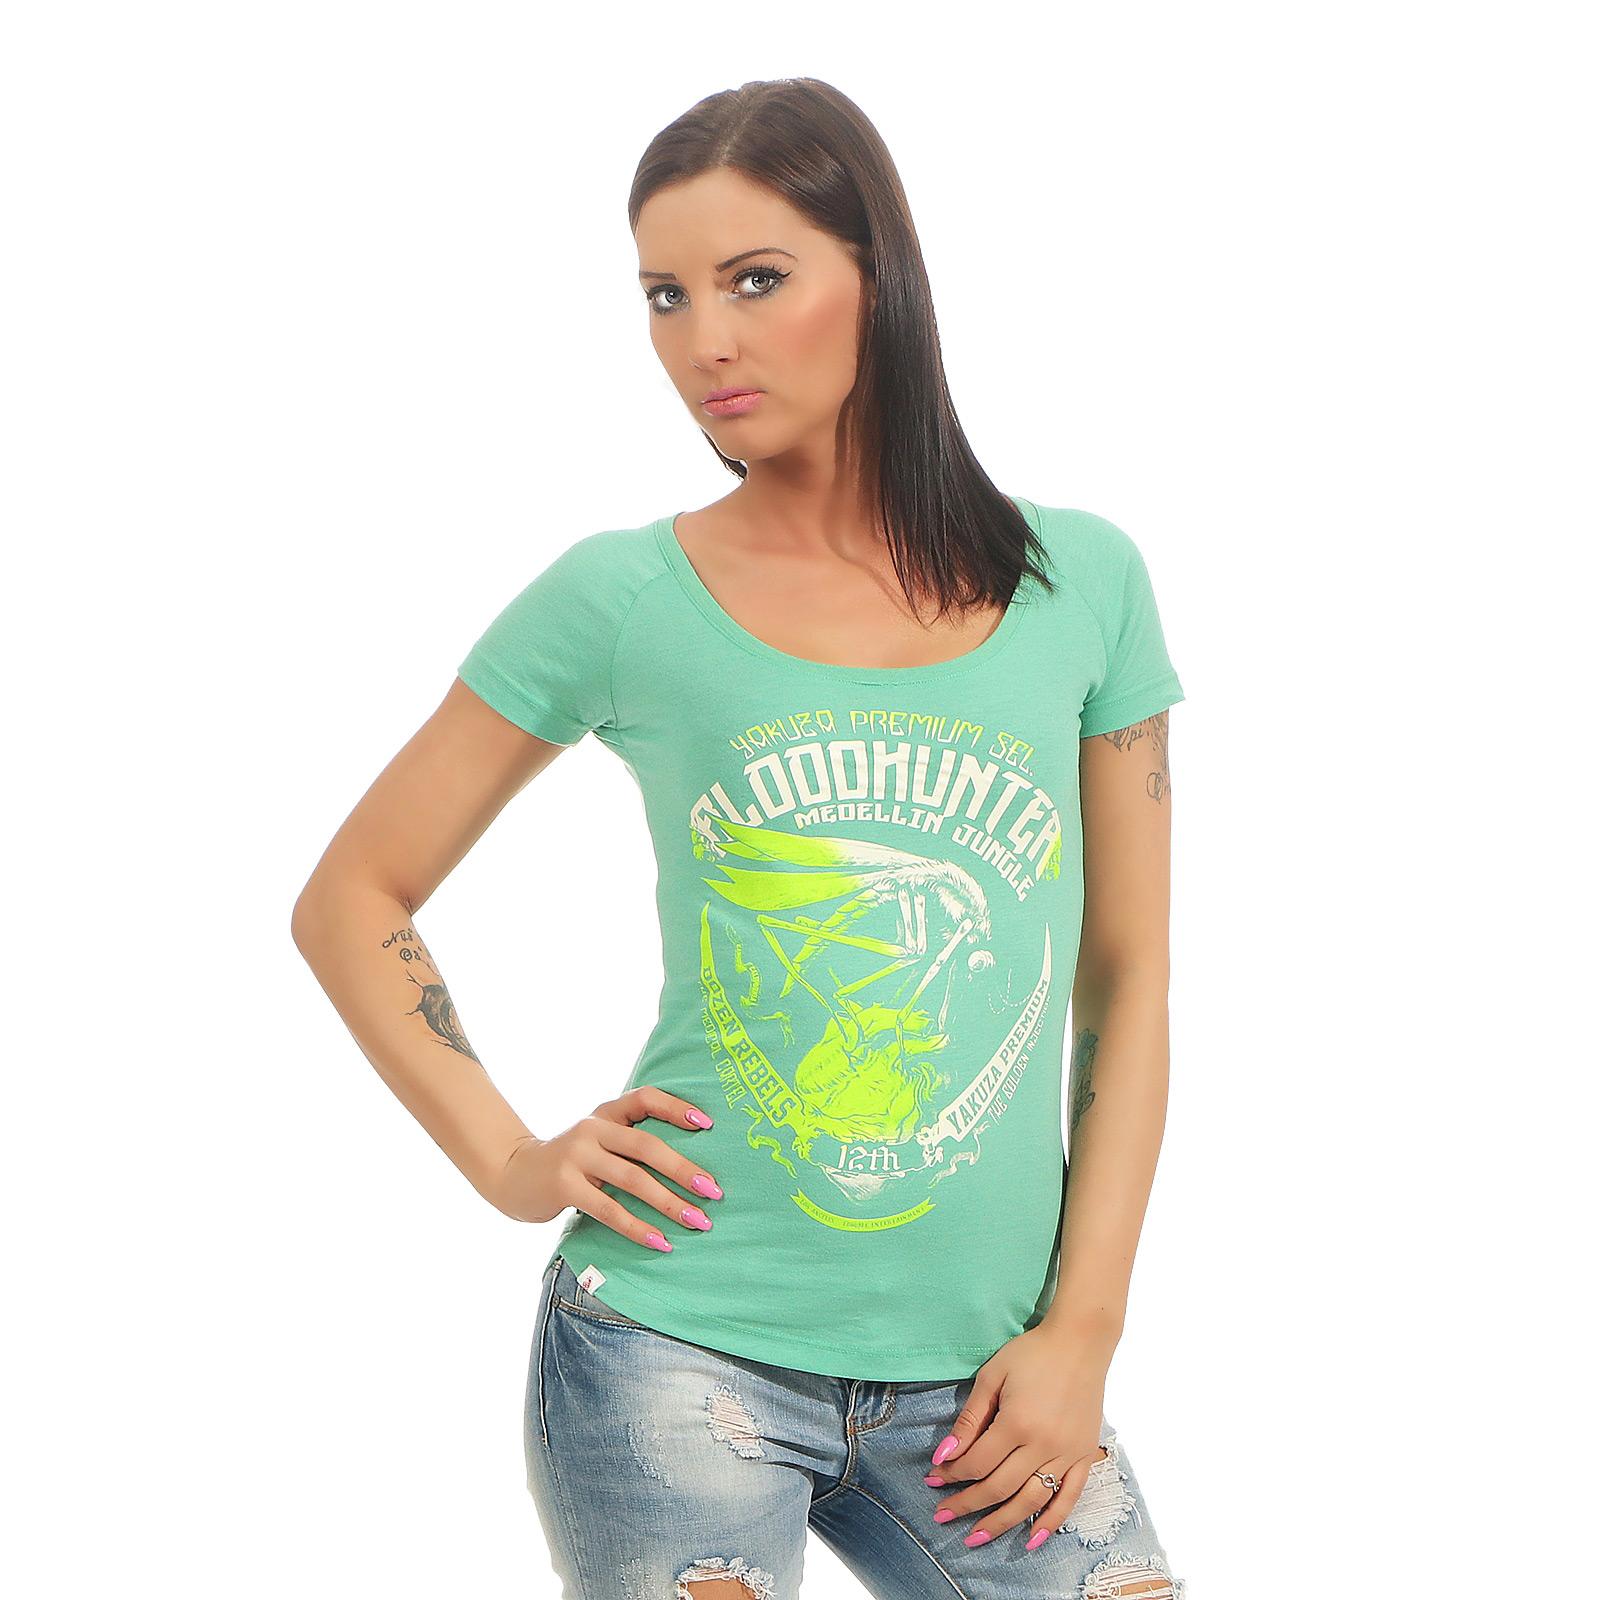 981c87e875da8 Yakuza Premium Damen T-Shirt GS 2433 grün DAMEN SHIRTS & TOPS